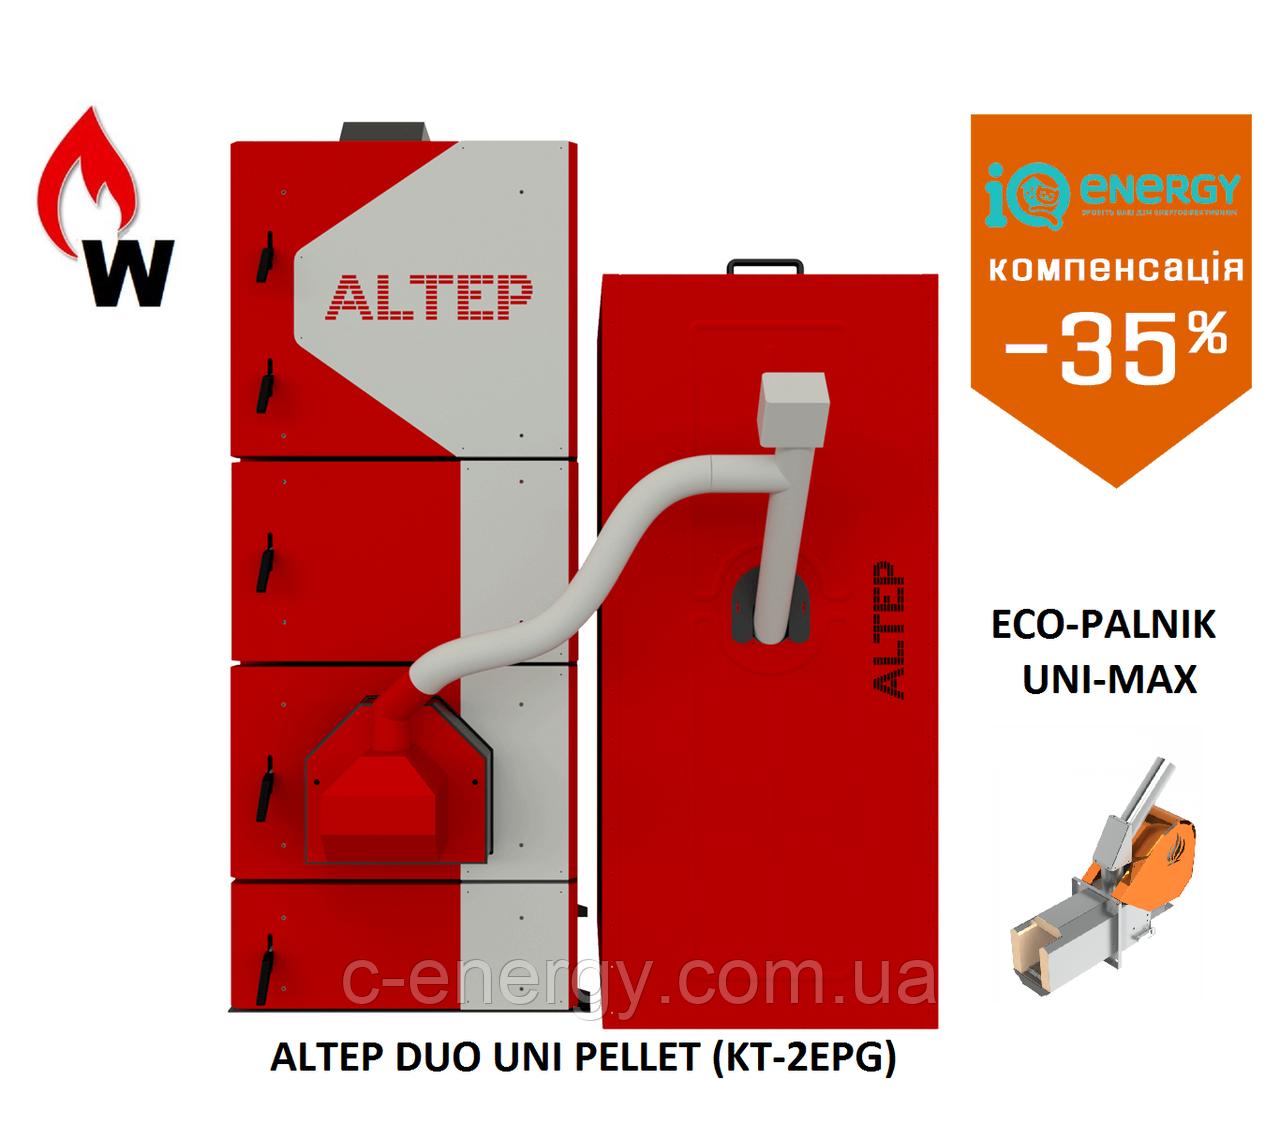 Пелетный котел Altep Duo Uni Pellet  62 кВт (KT-2EPG) +Eco-Palnik Uni-MAX, фото 1